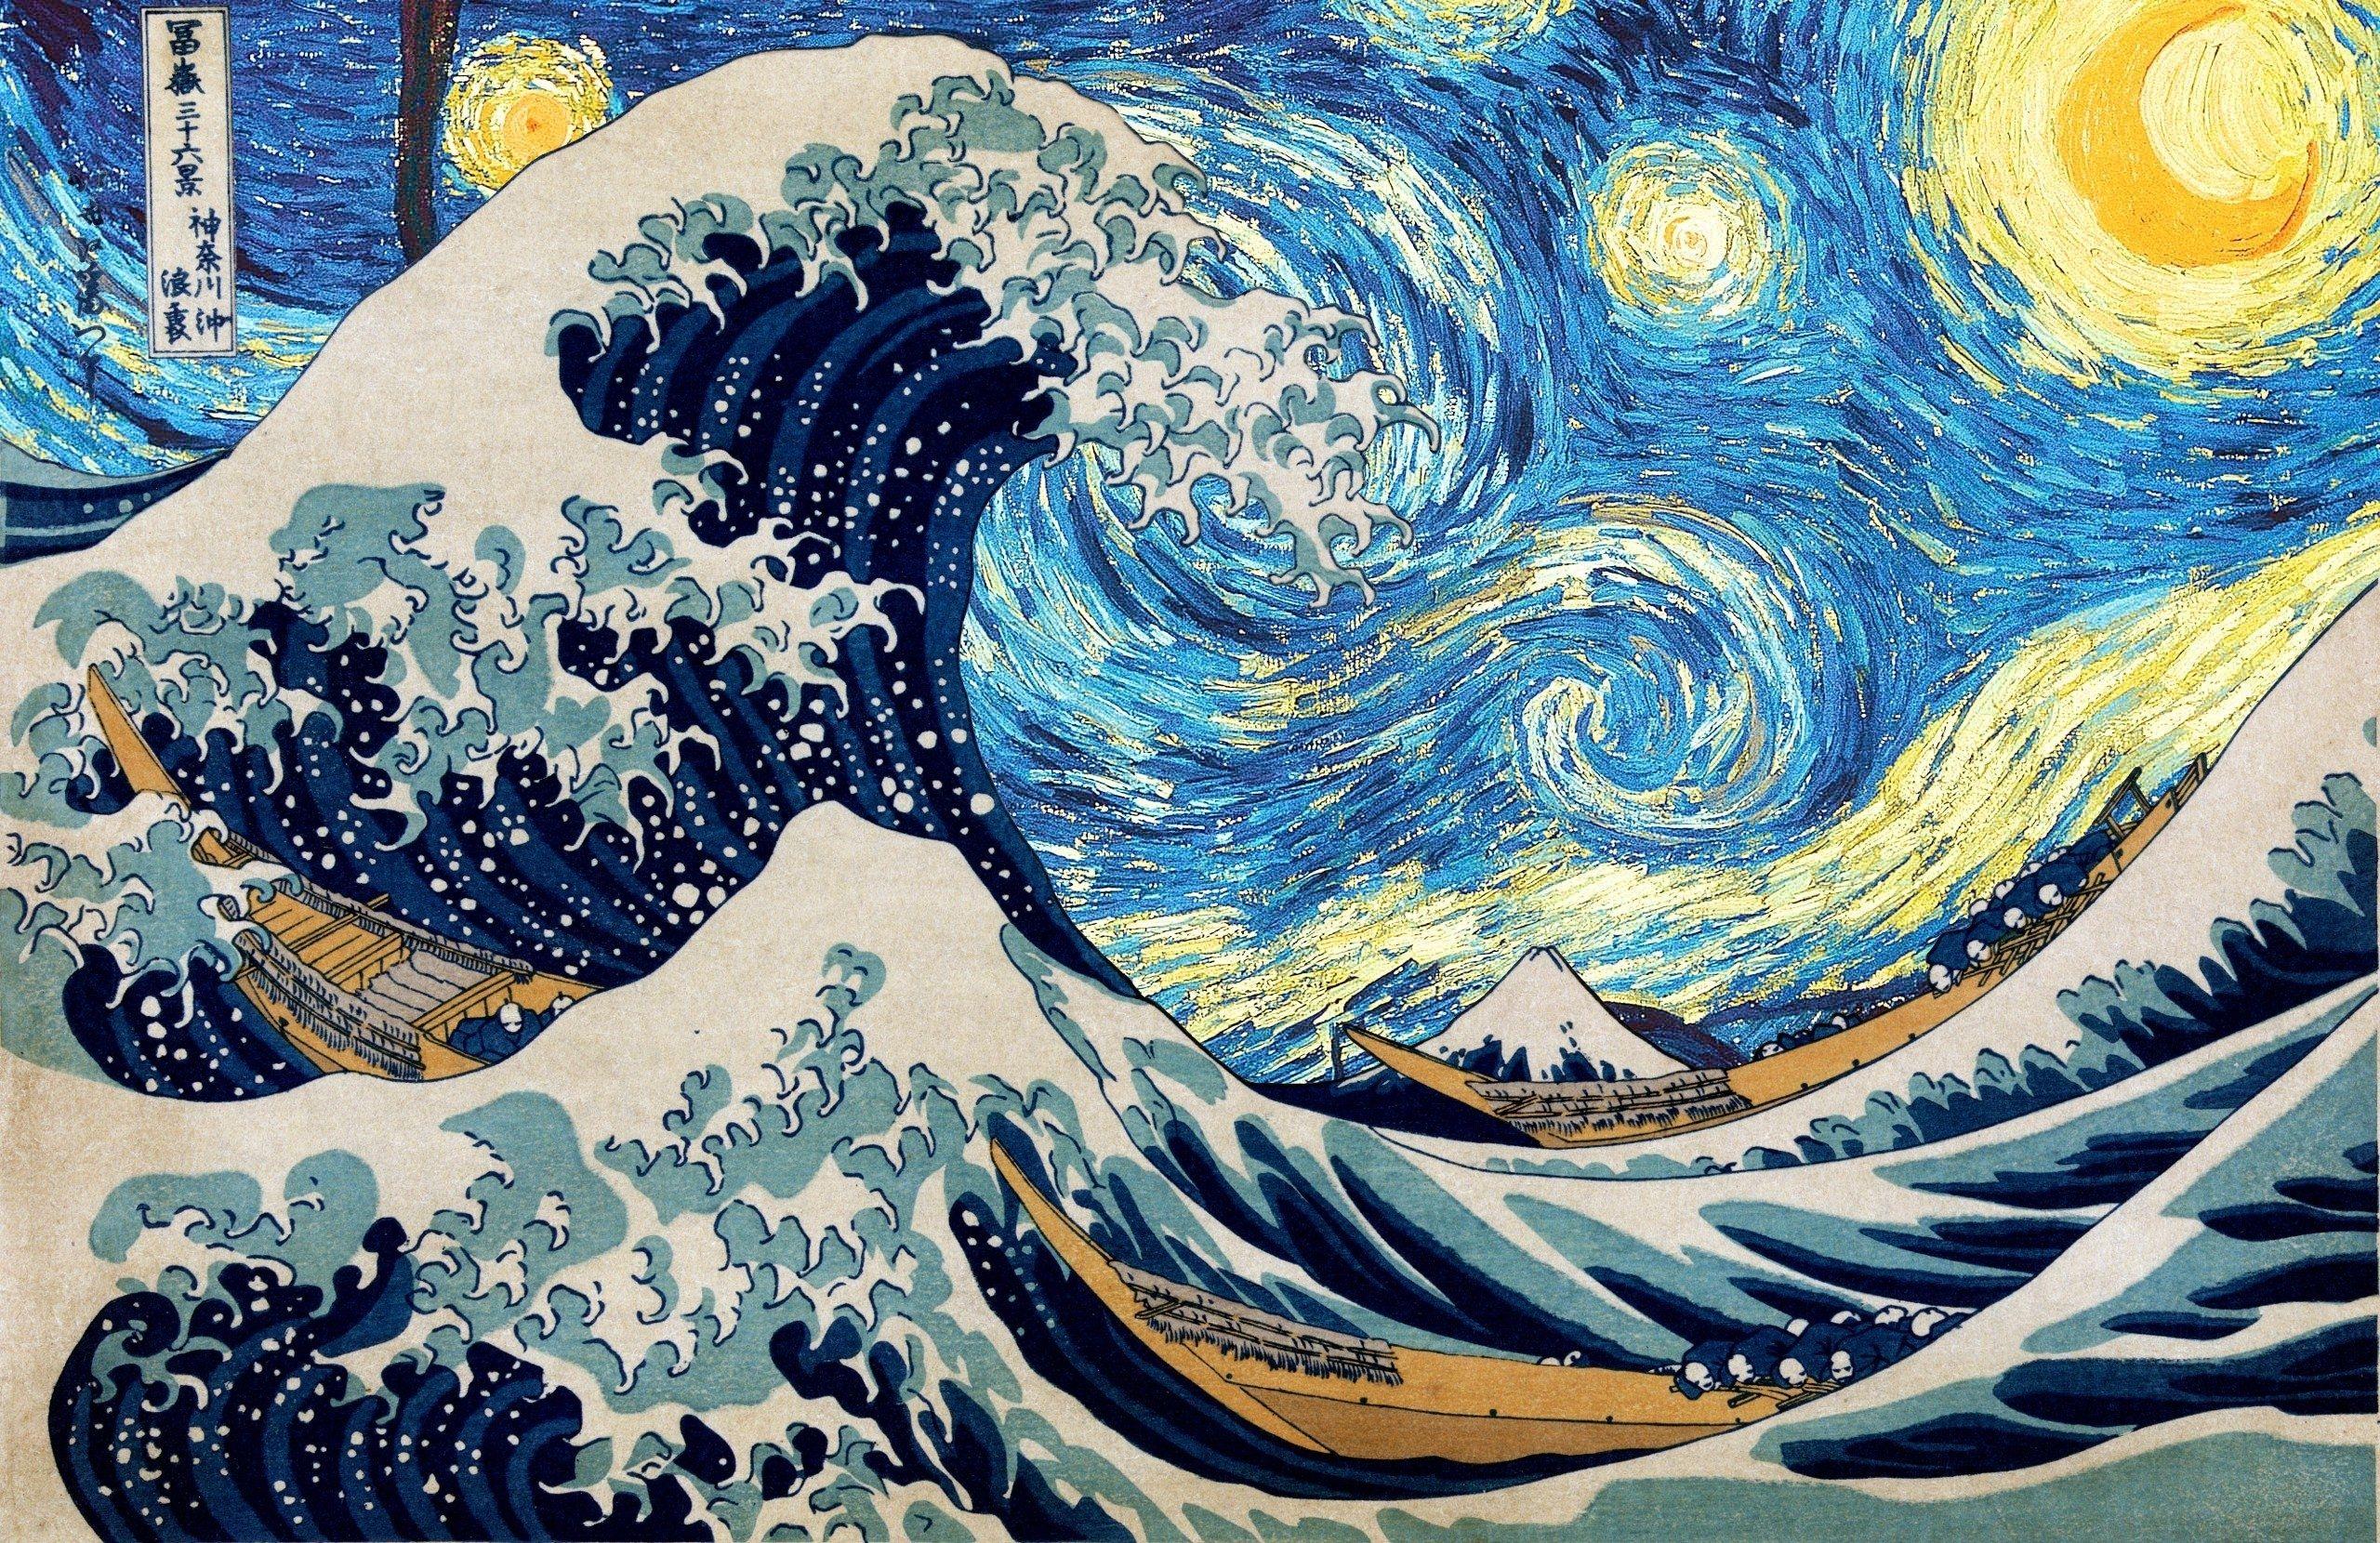 The Great Wave Of Kanagawa Starry Night Hd Wallpaper Starry Night Wallpaper Van Gogh Wallpaper Desktop Wallpaper Art